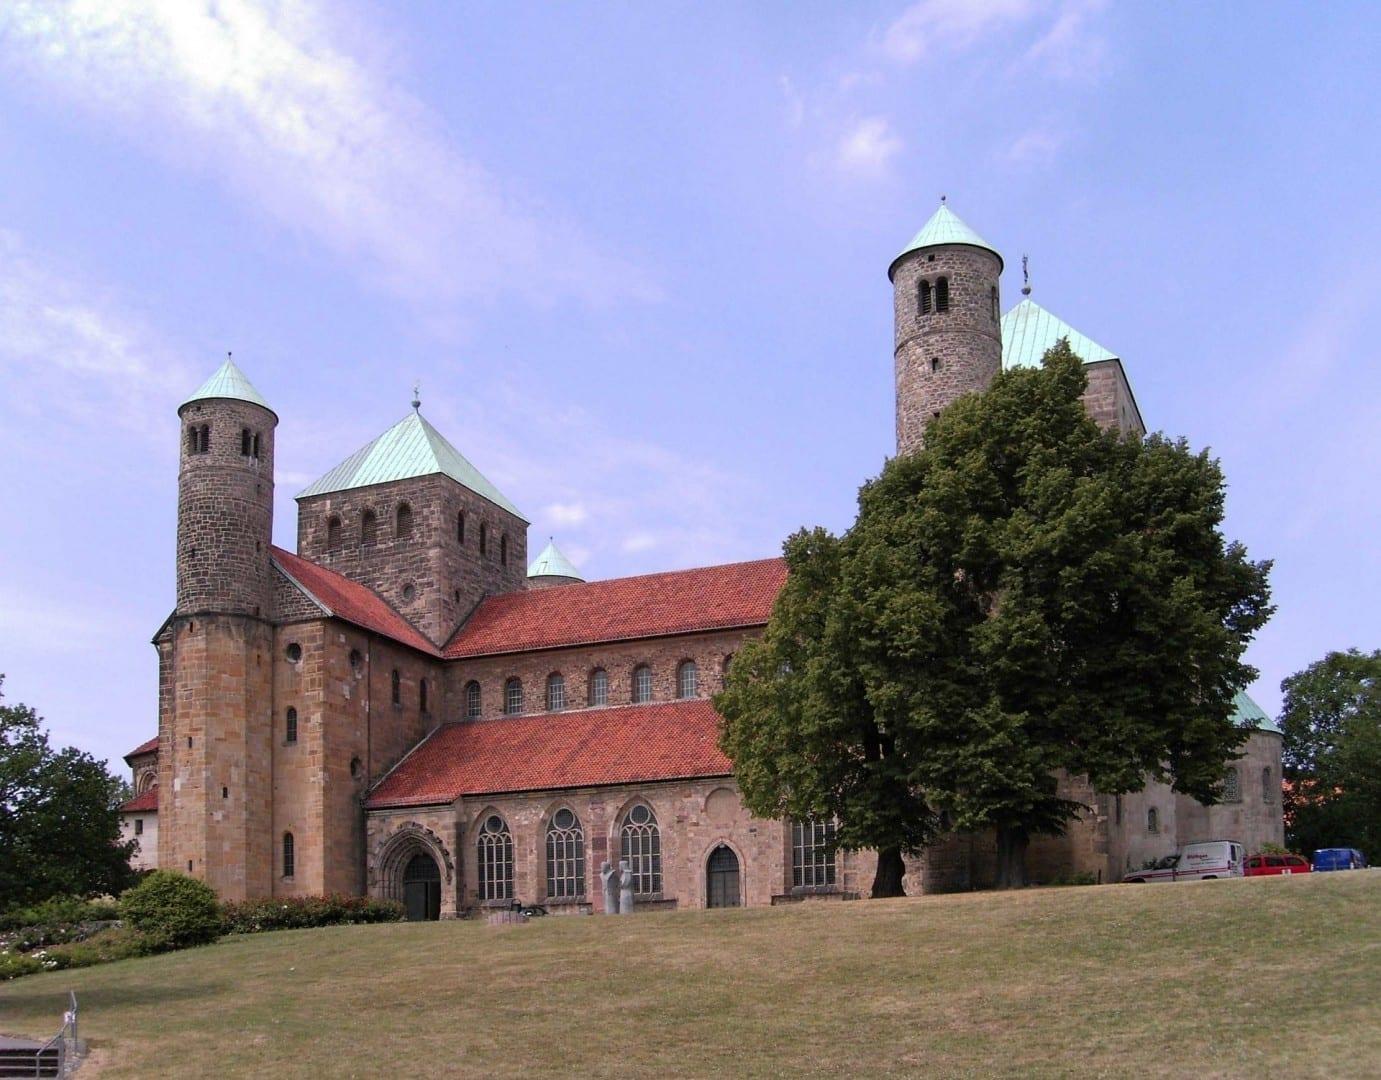 Iglesia de San Miguel (Michaeliskirche) - Patrimonio Cultural de la Humanidad Hildesheim Alemania